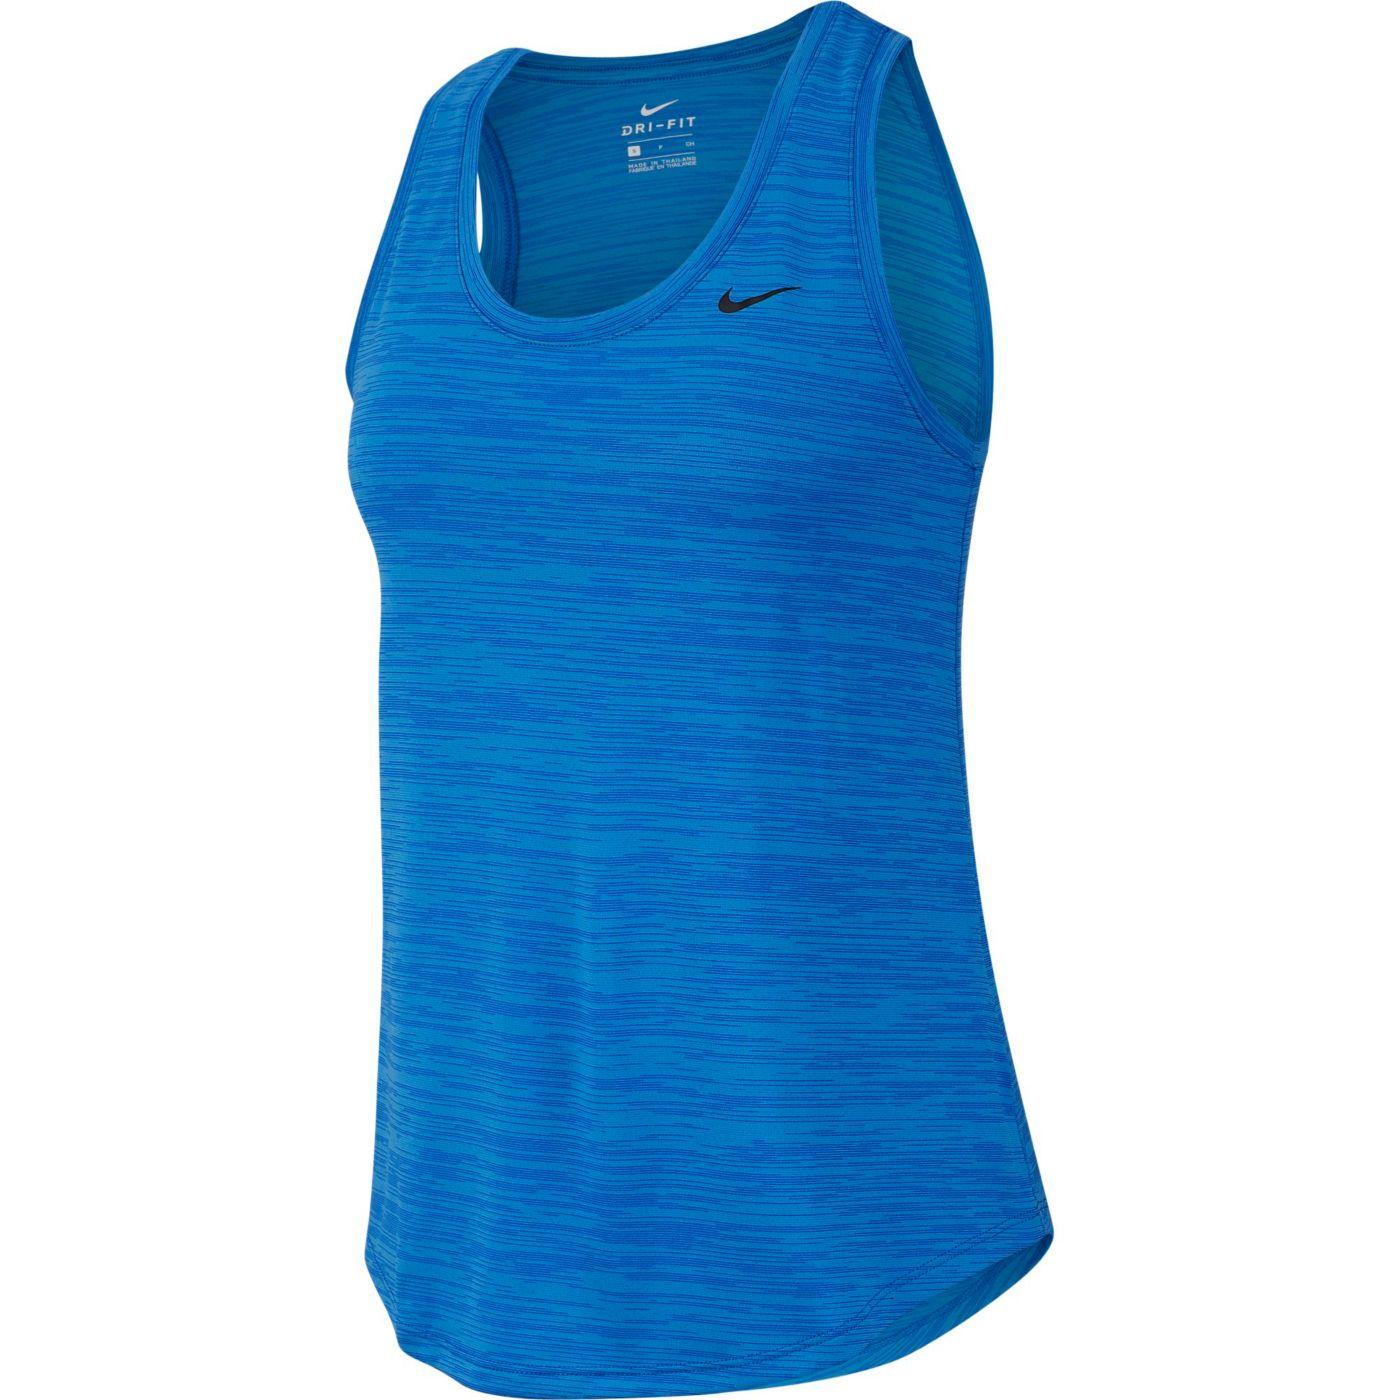 Nike  Women's Dri-FIT Legend Training Tank Top